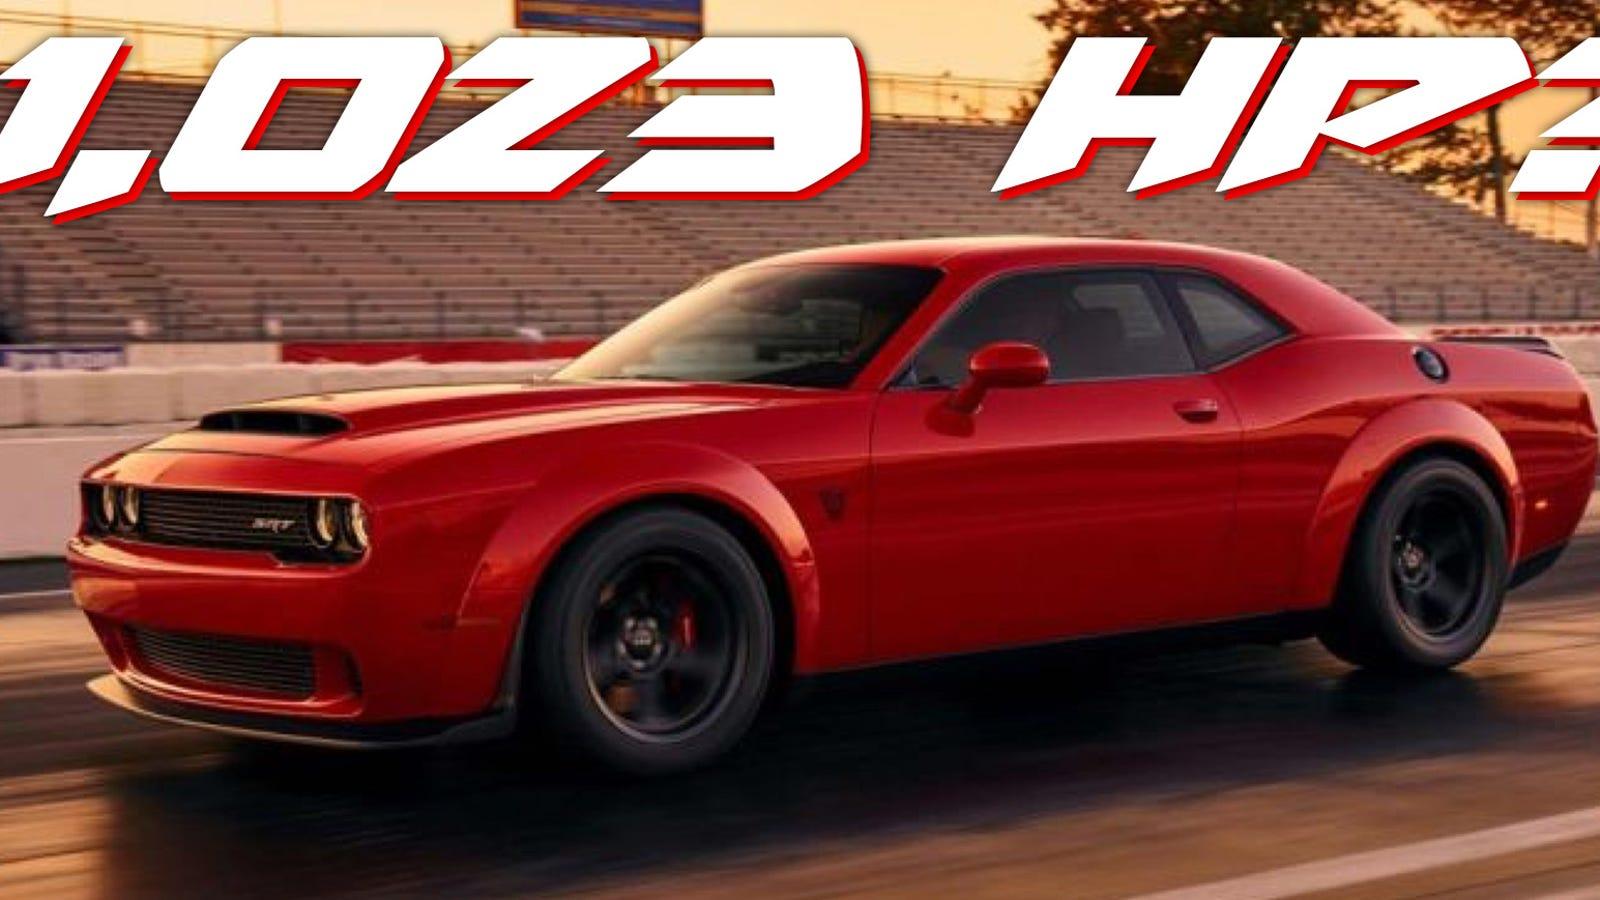 Progressive Dodge >> Crazy Rumors Say The 2018 Dodge Challenger SRT Demon Has Up To 1023 Horsepower